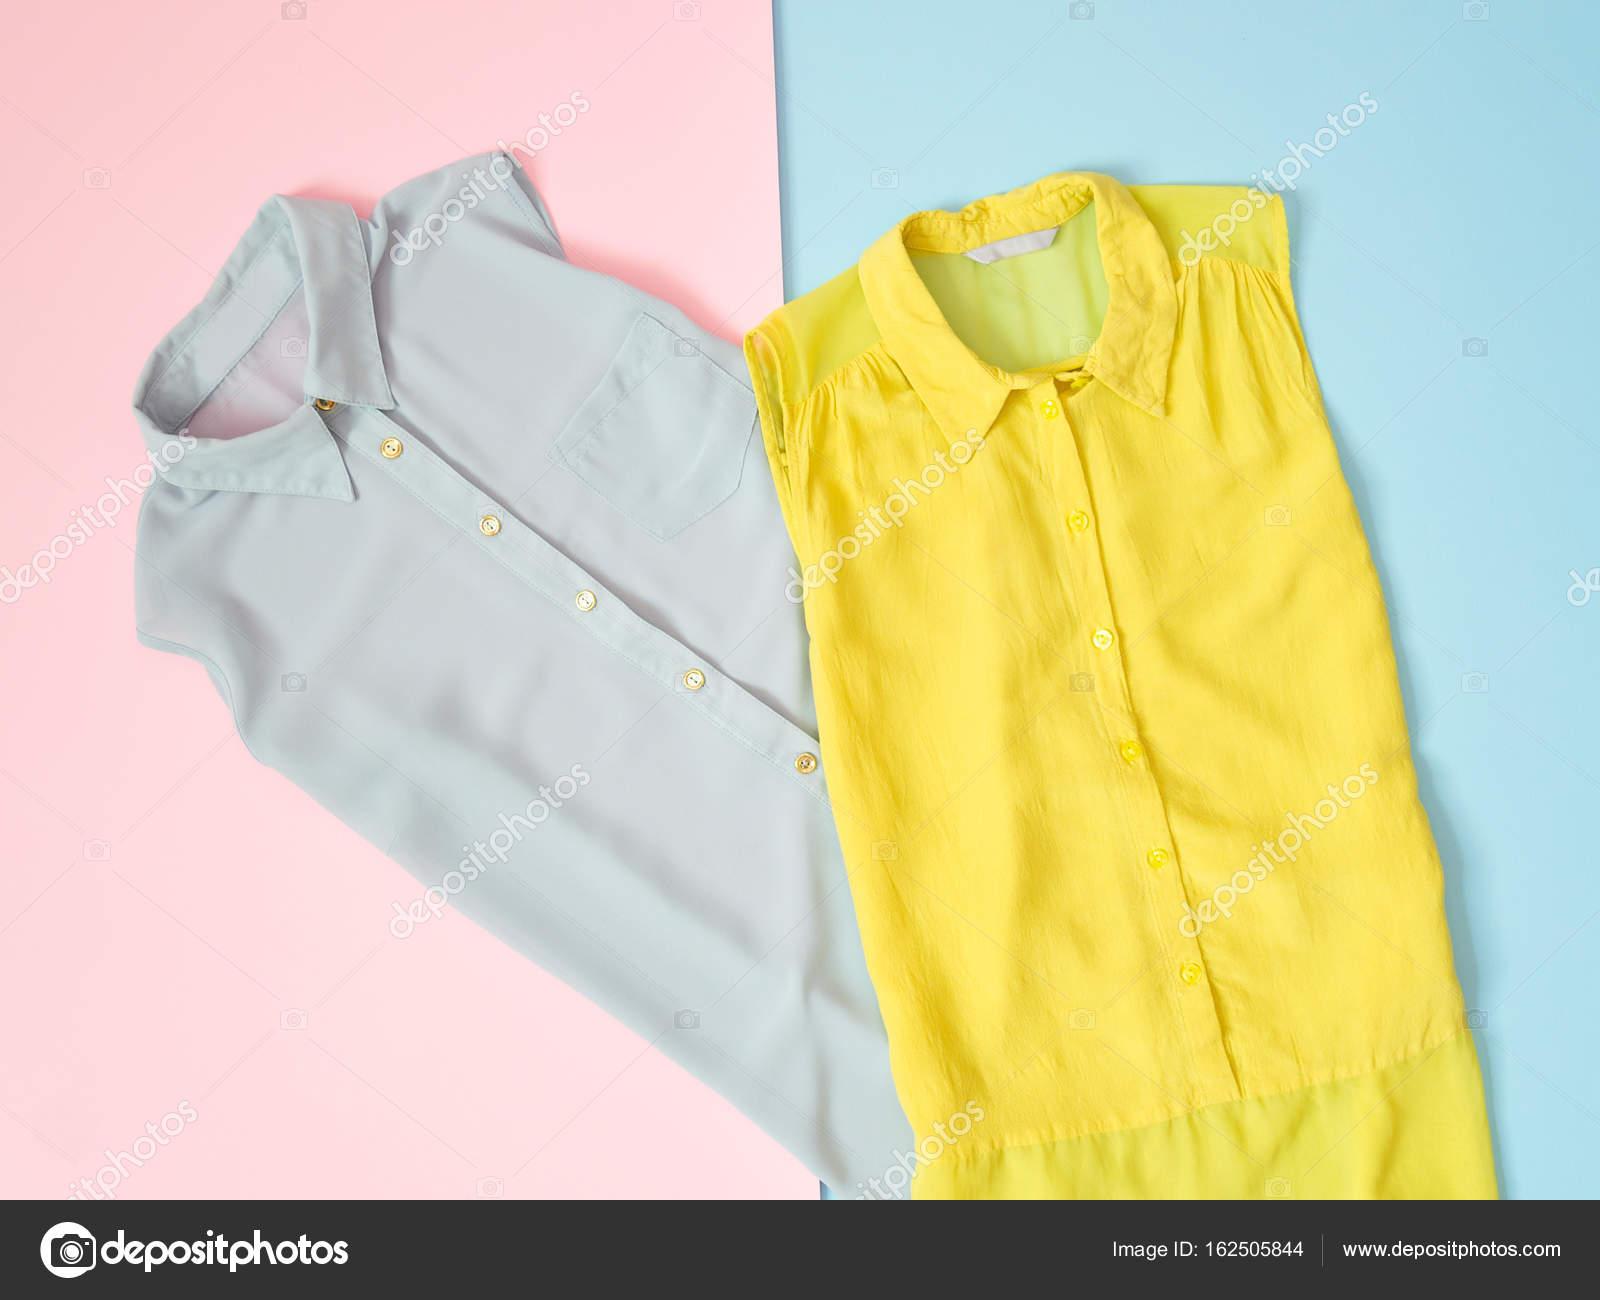 b4fc1298f471 Μπλε και πράσινη μπλούζα με ροζ-μπλε φόντο. Μοντέρνα έννοια — Φωτογραφία  Αρχείου